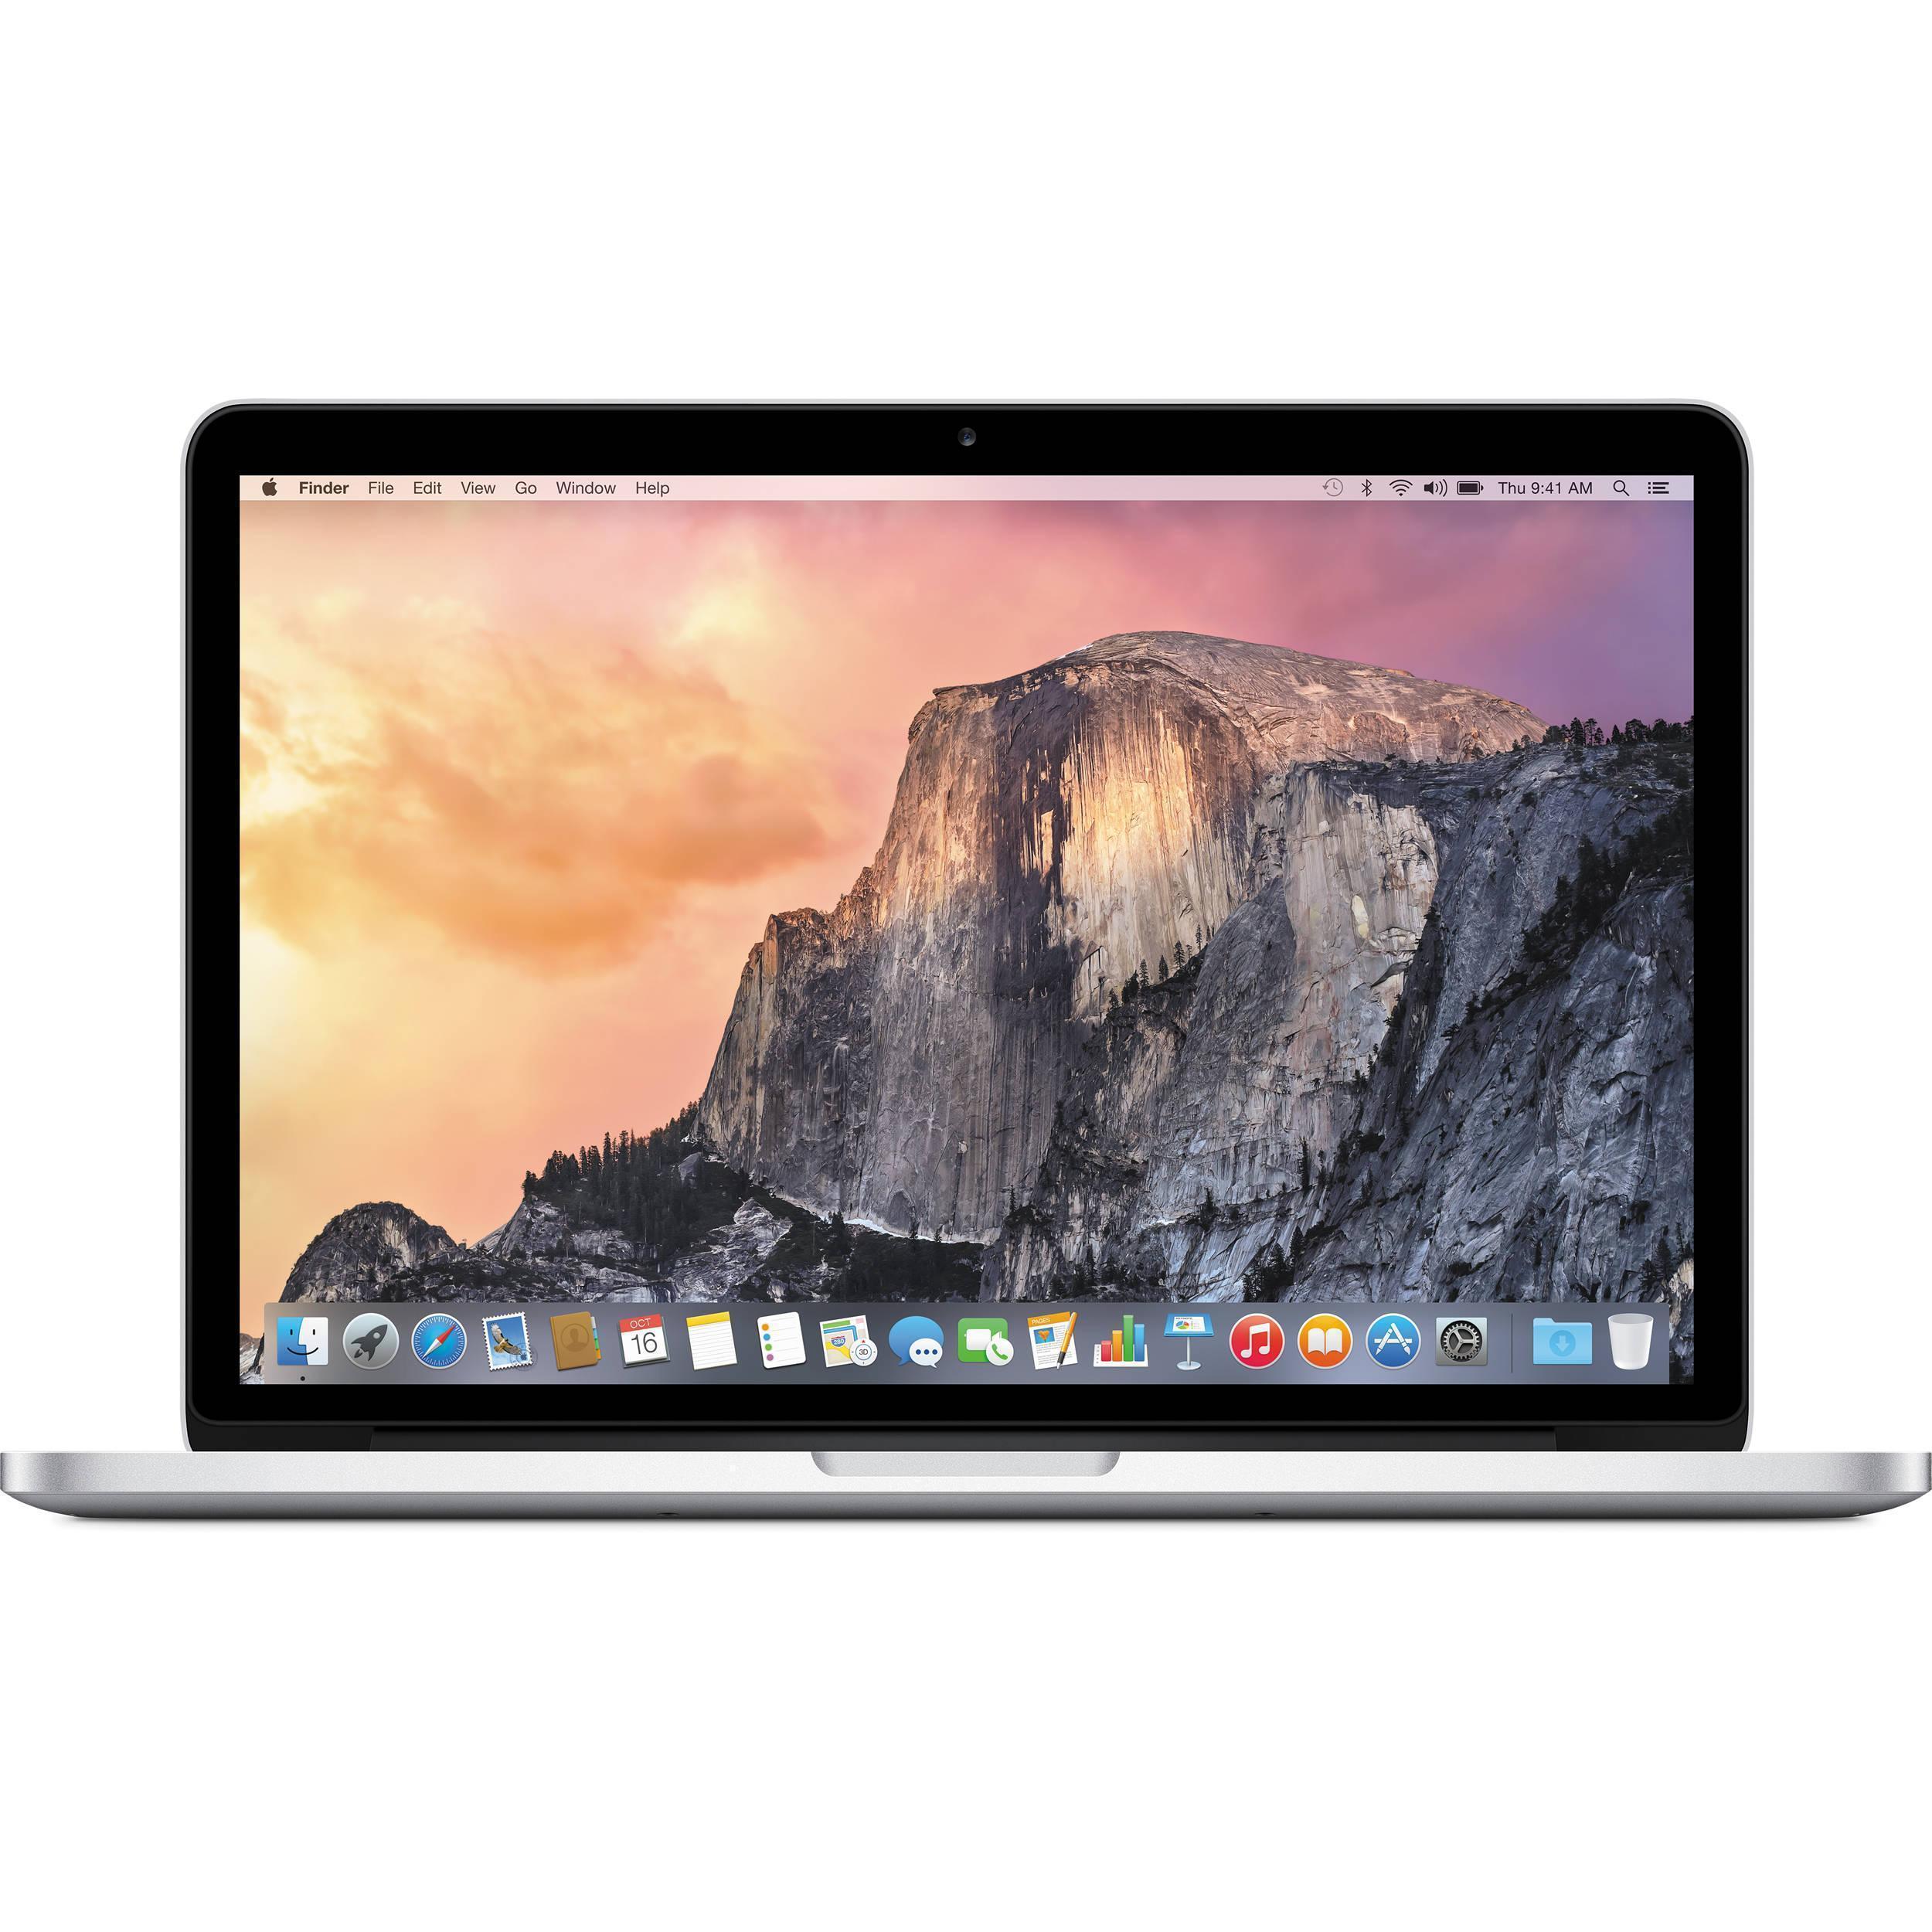 MacBook Pro Retina 13.3-inch (2015) - Core i7 - 8GB - SSD 256 GB